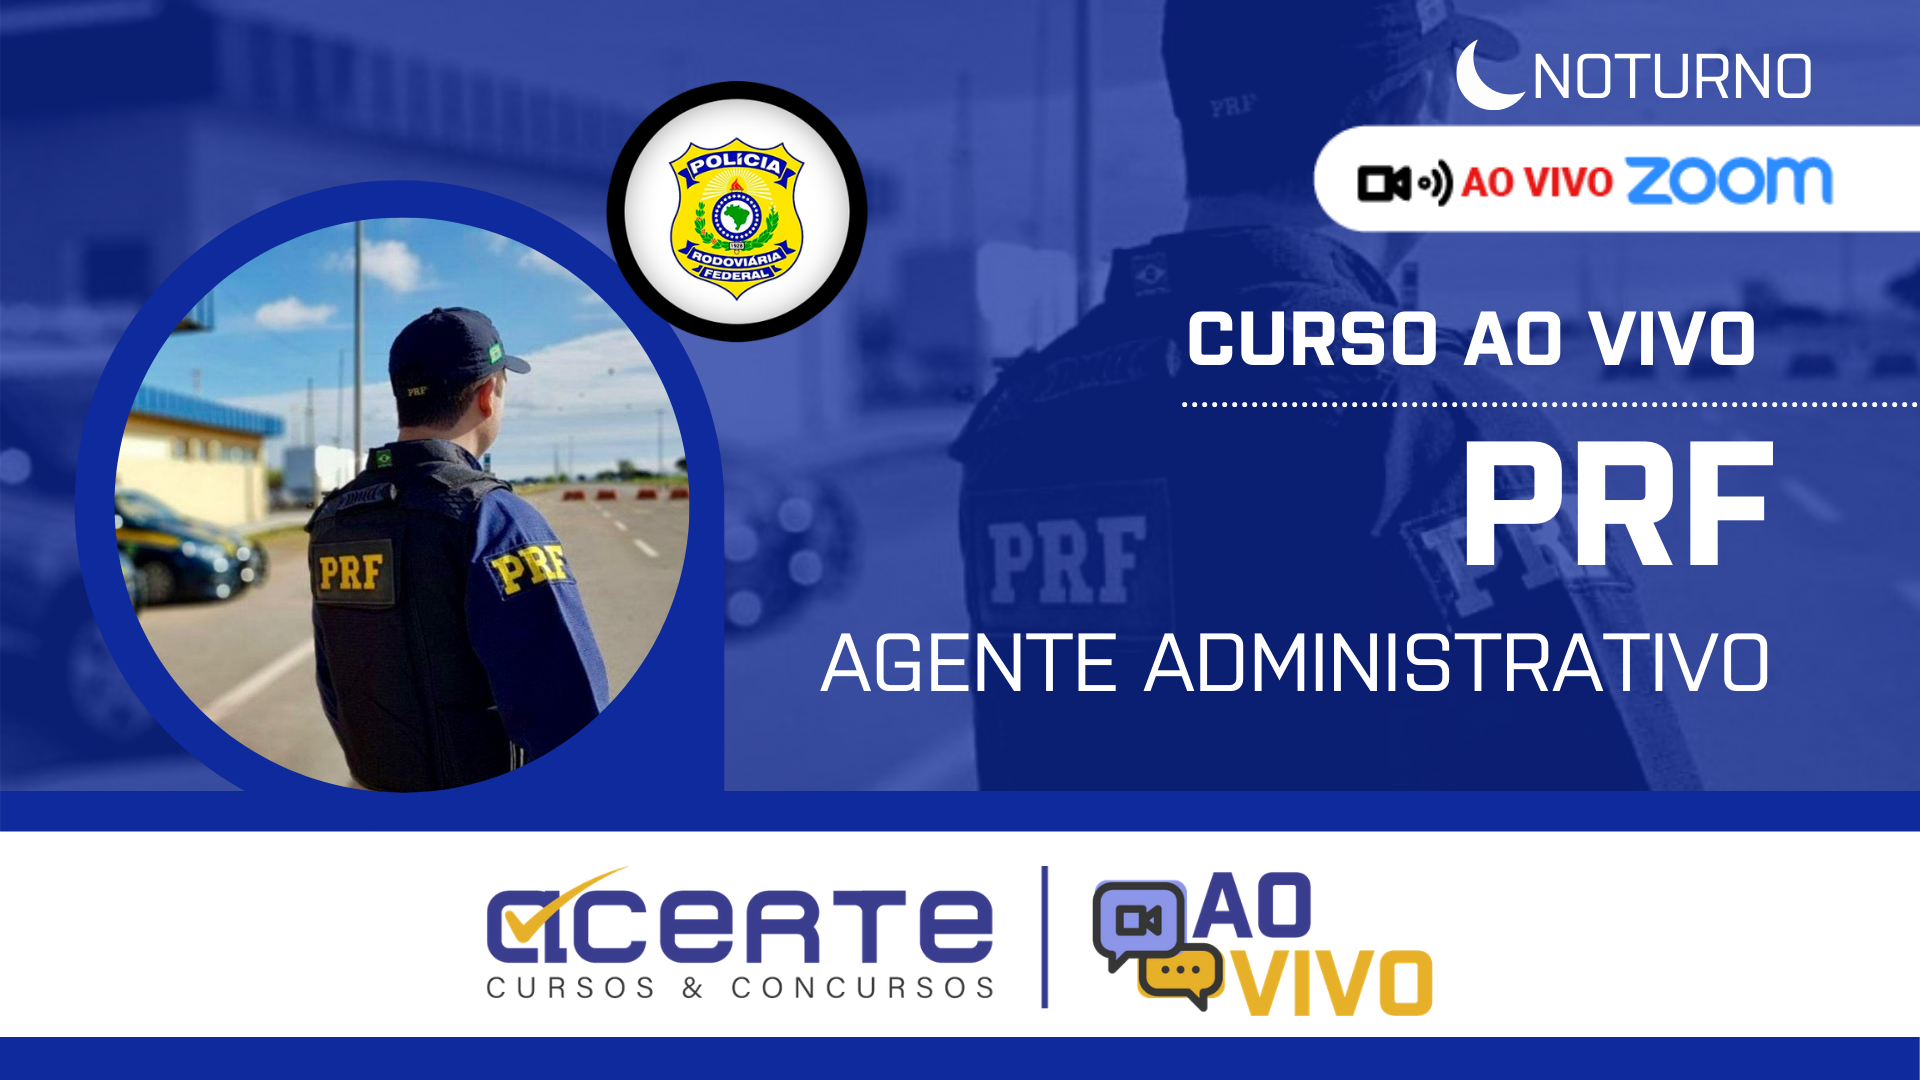 Polícia Rodoviária Federal - PRF - Agente Administrativo AO VIVO - Noturno